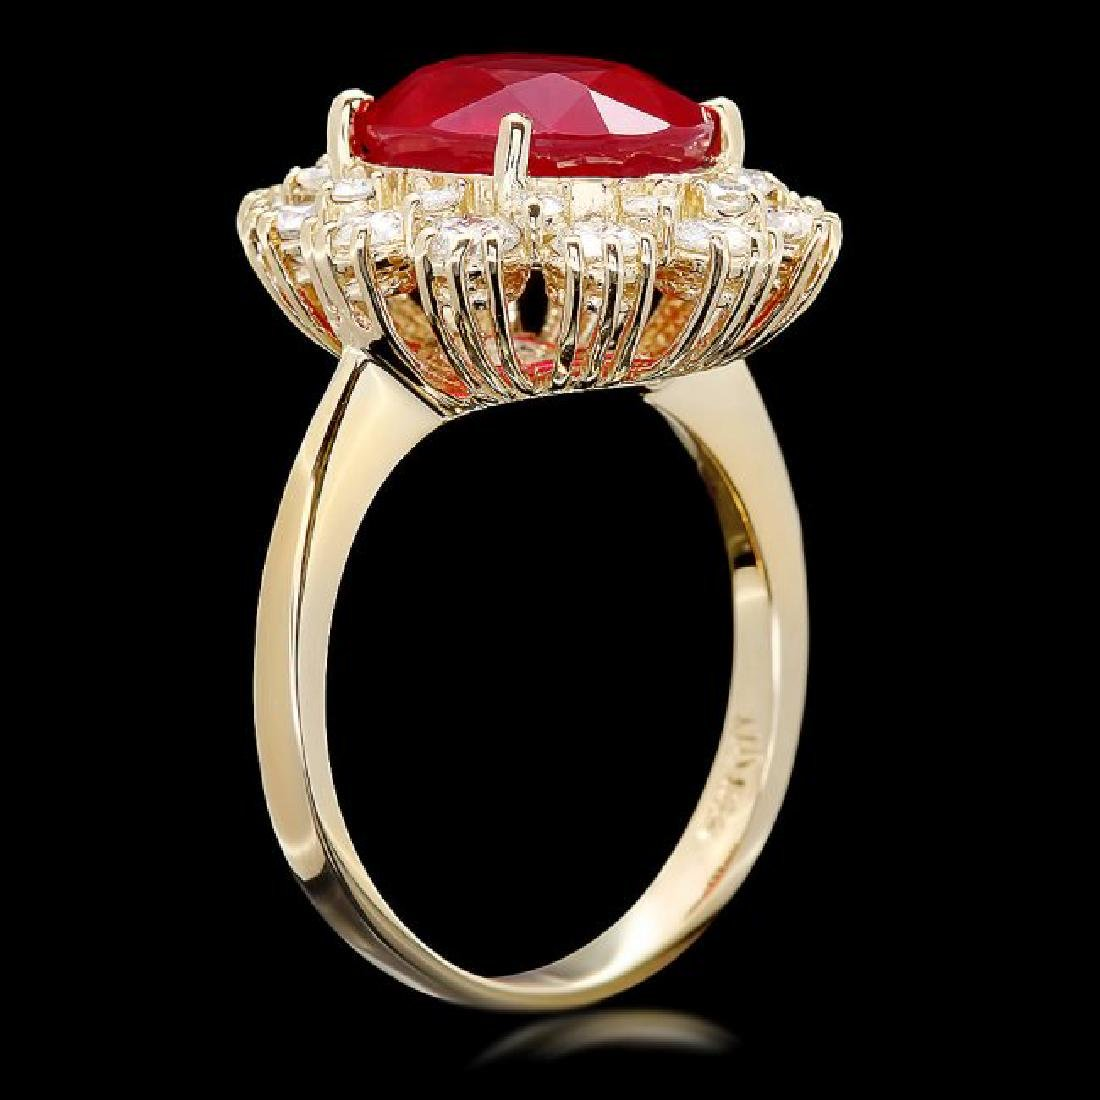 14k Yellow Gold 5.50ct Ruby 1.30ct Diamond Ring - 3